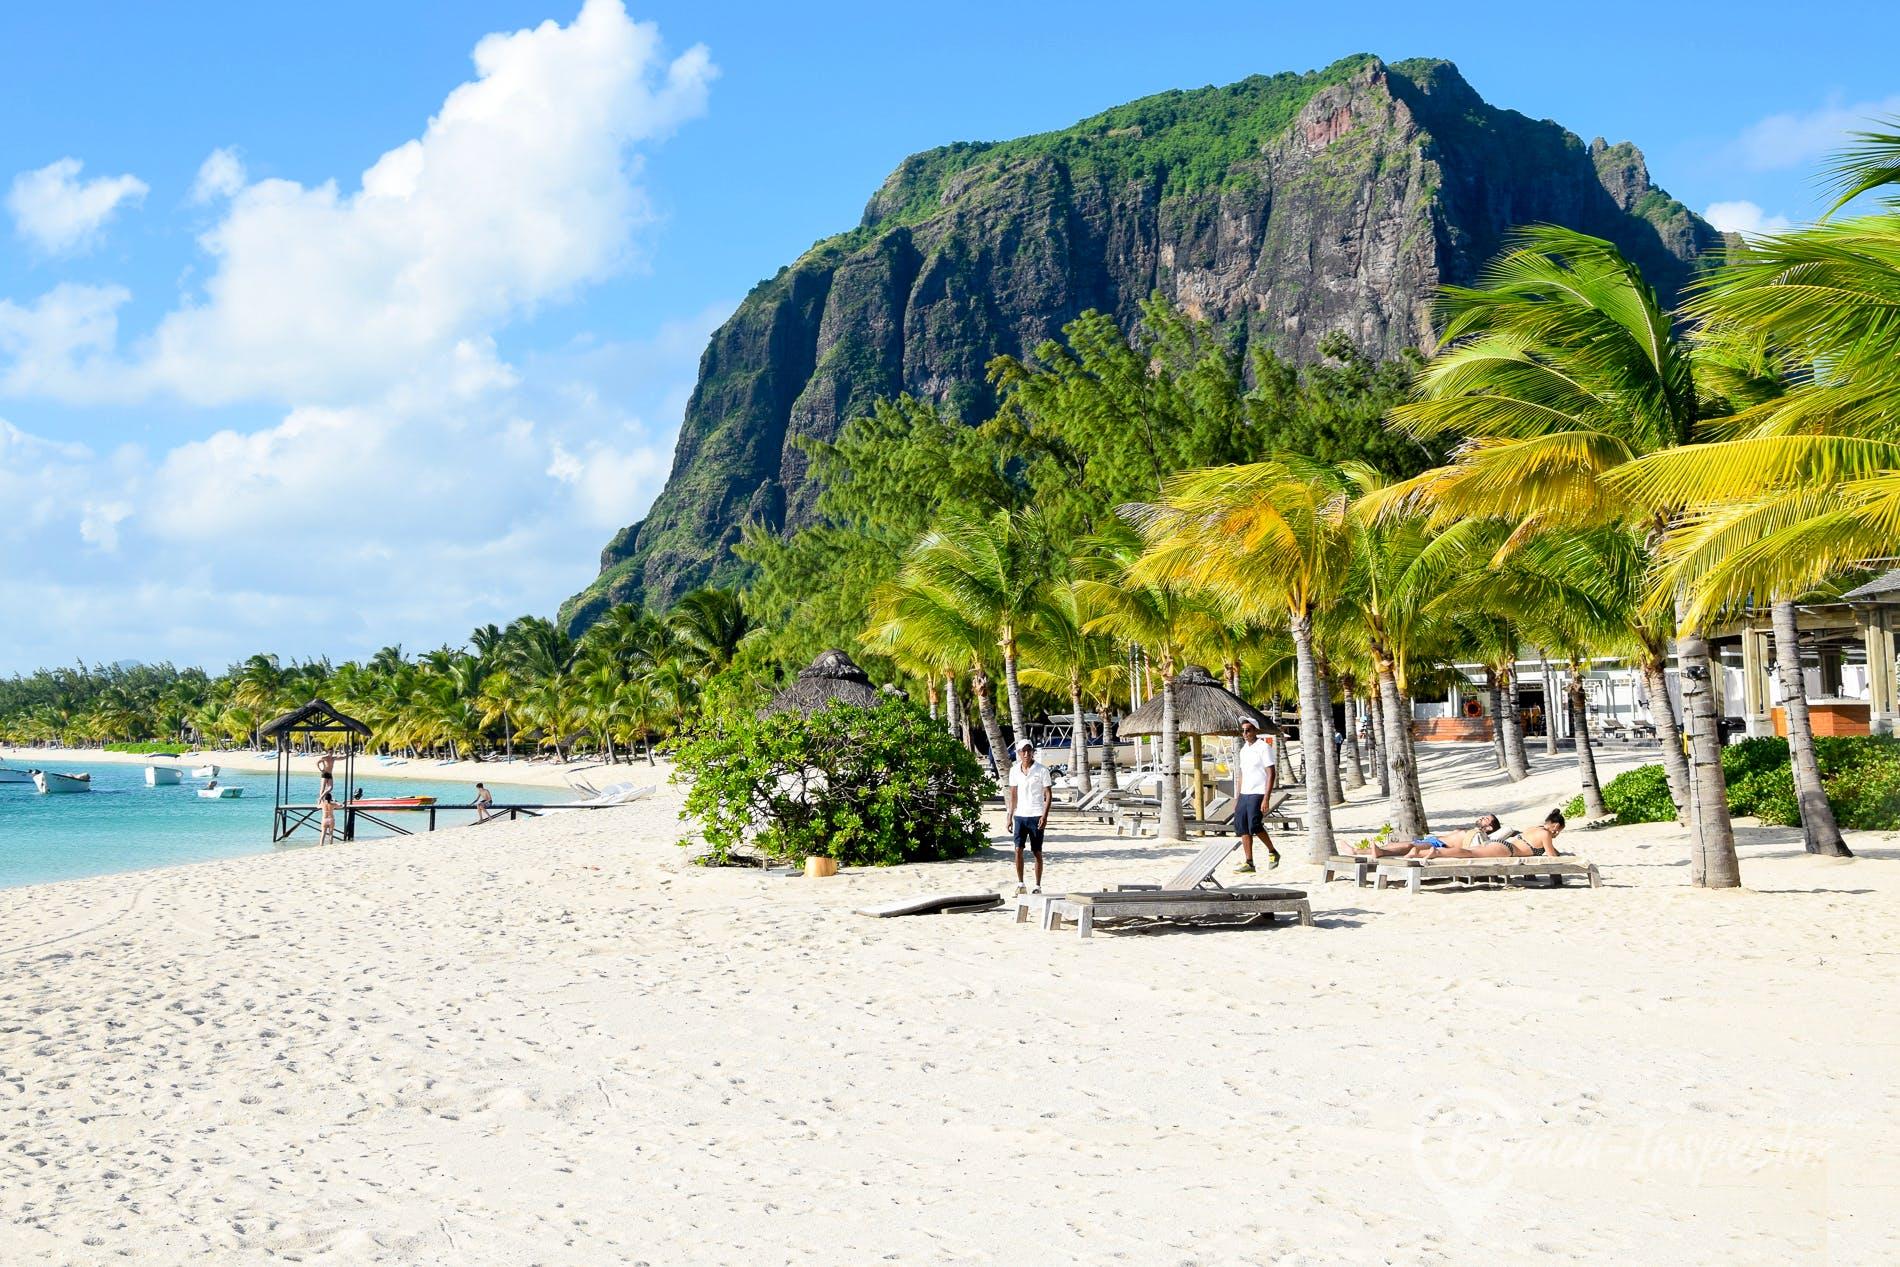 Beach The St. Regis Mauritius Resort Beach, Mauritius,